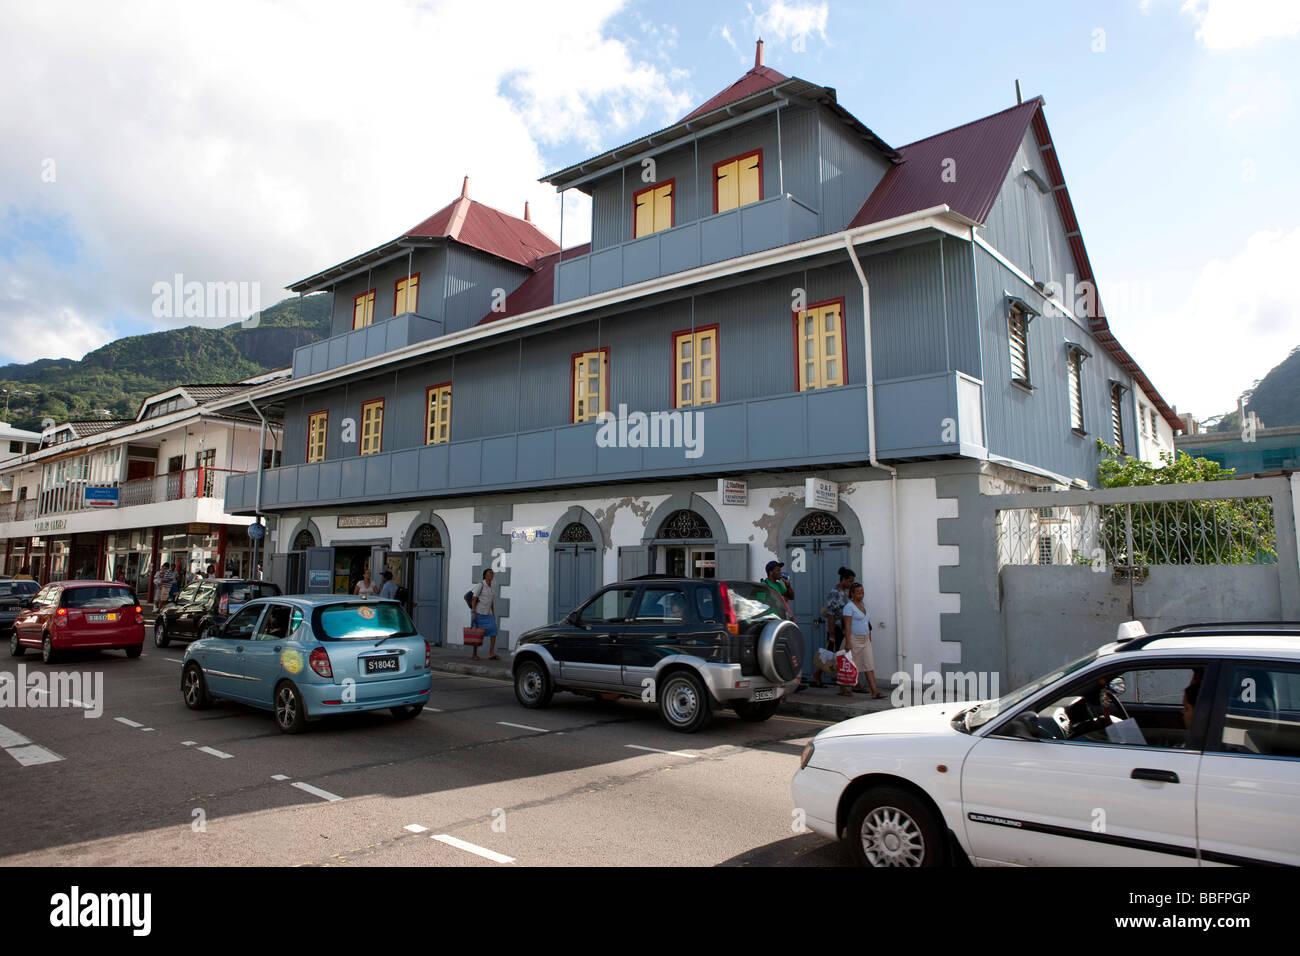 Commercial building on Albert Street, capital city Victoria, Mahe Island, Seychelles, Indian Ocean, Africa - Stock Image